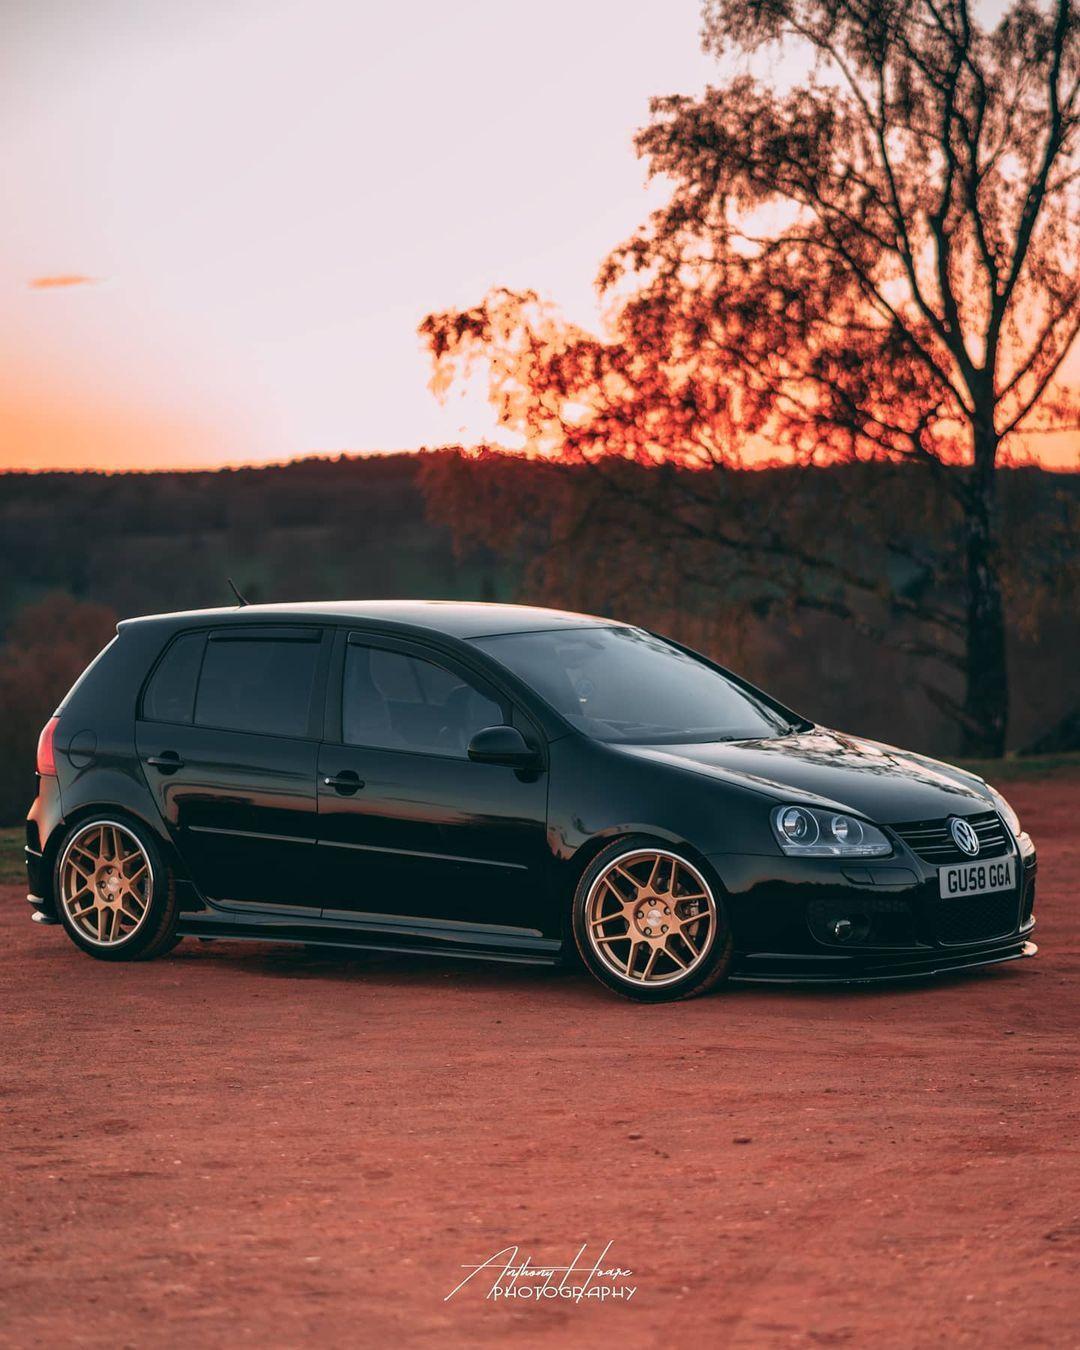 3SDM 0.09 x VW Golf MK5⠀⠀